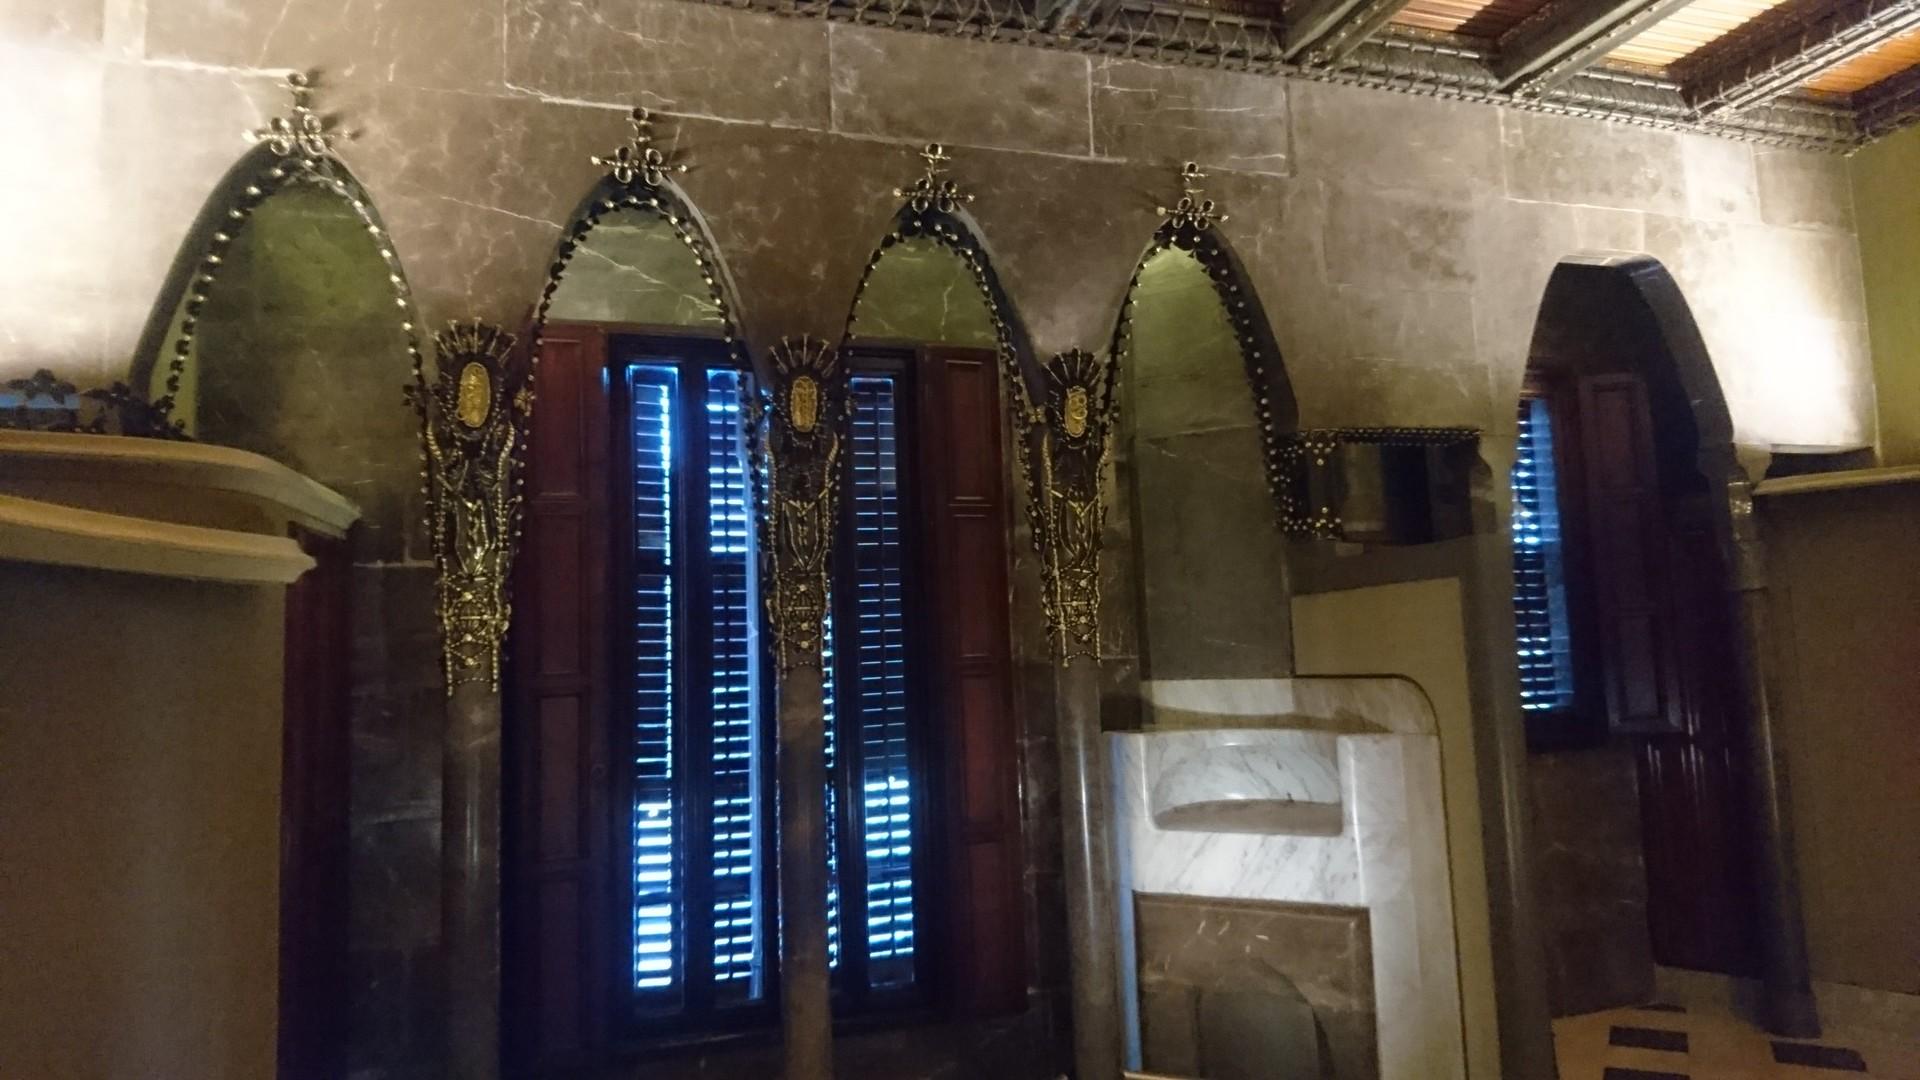 the-quirky-mansion-ive-seen-465de11404da